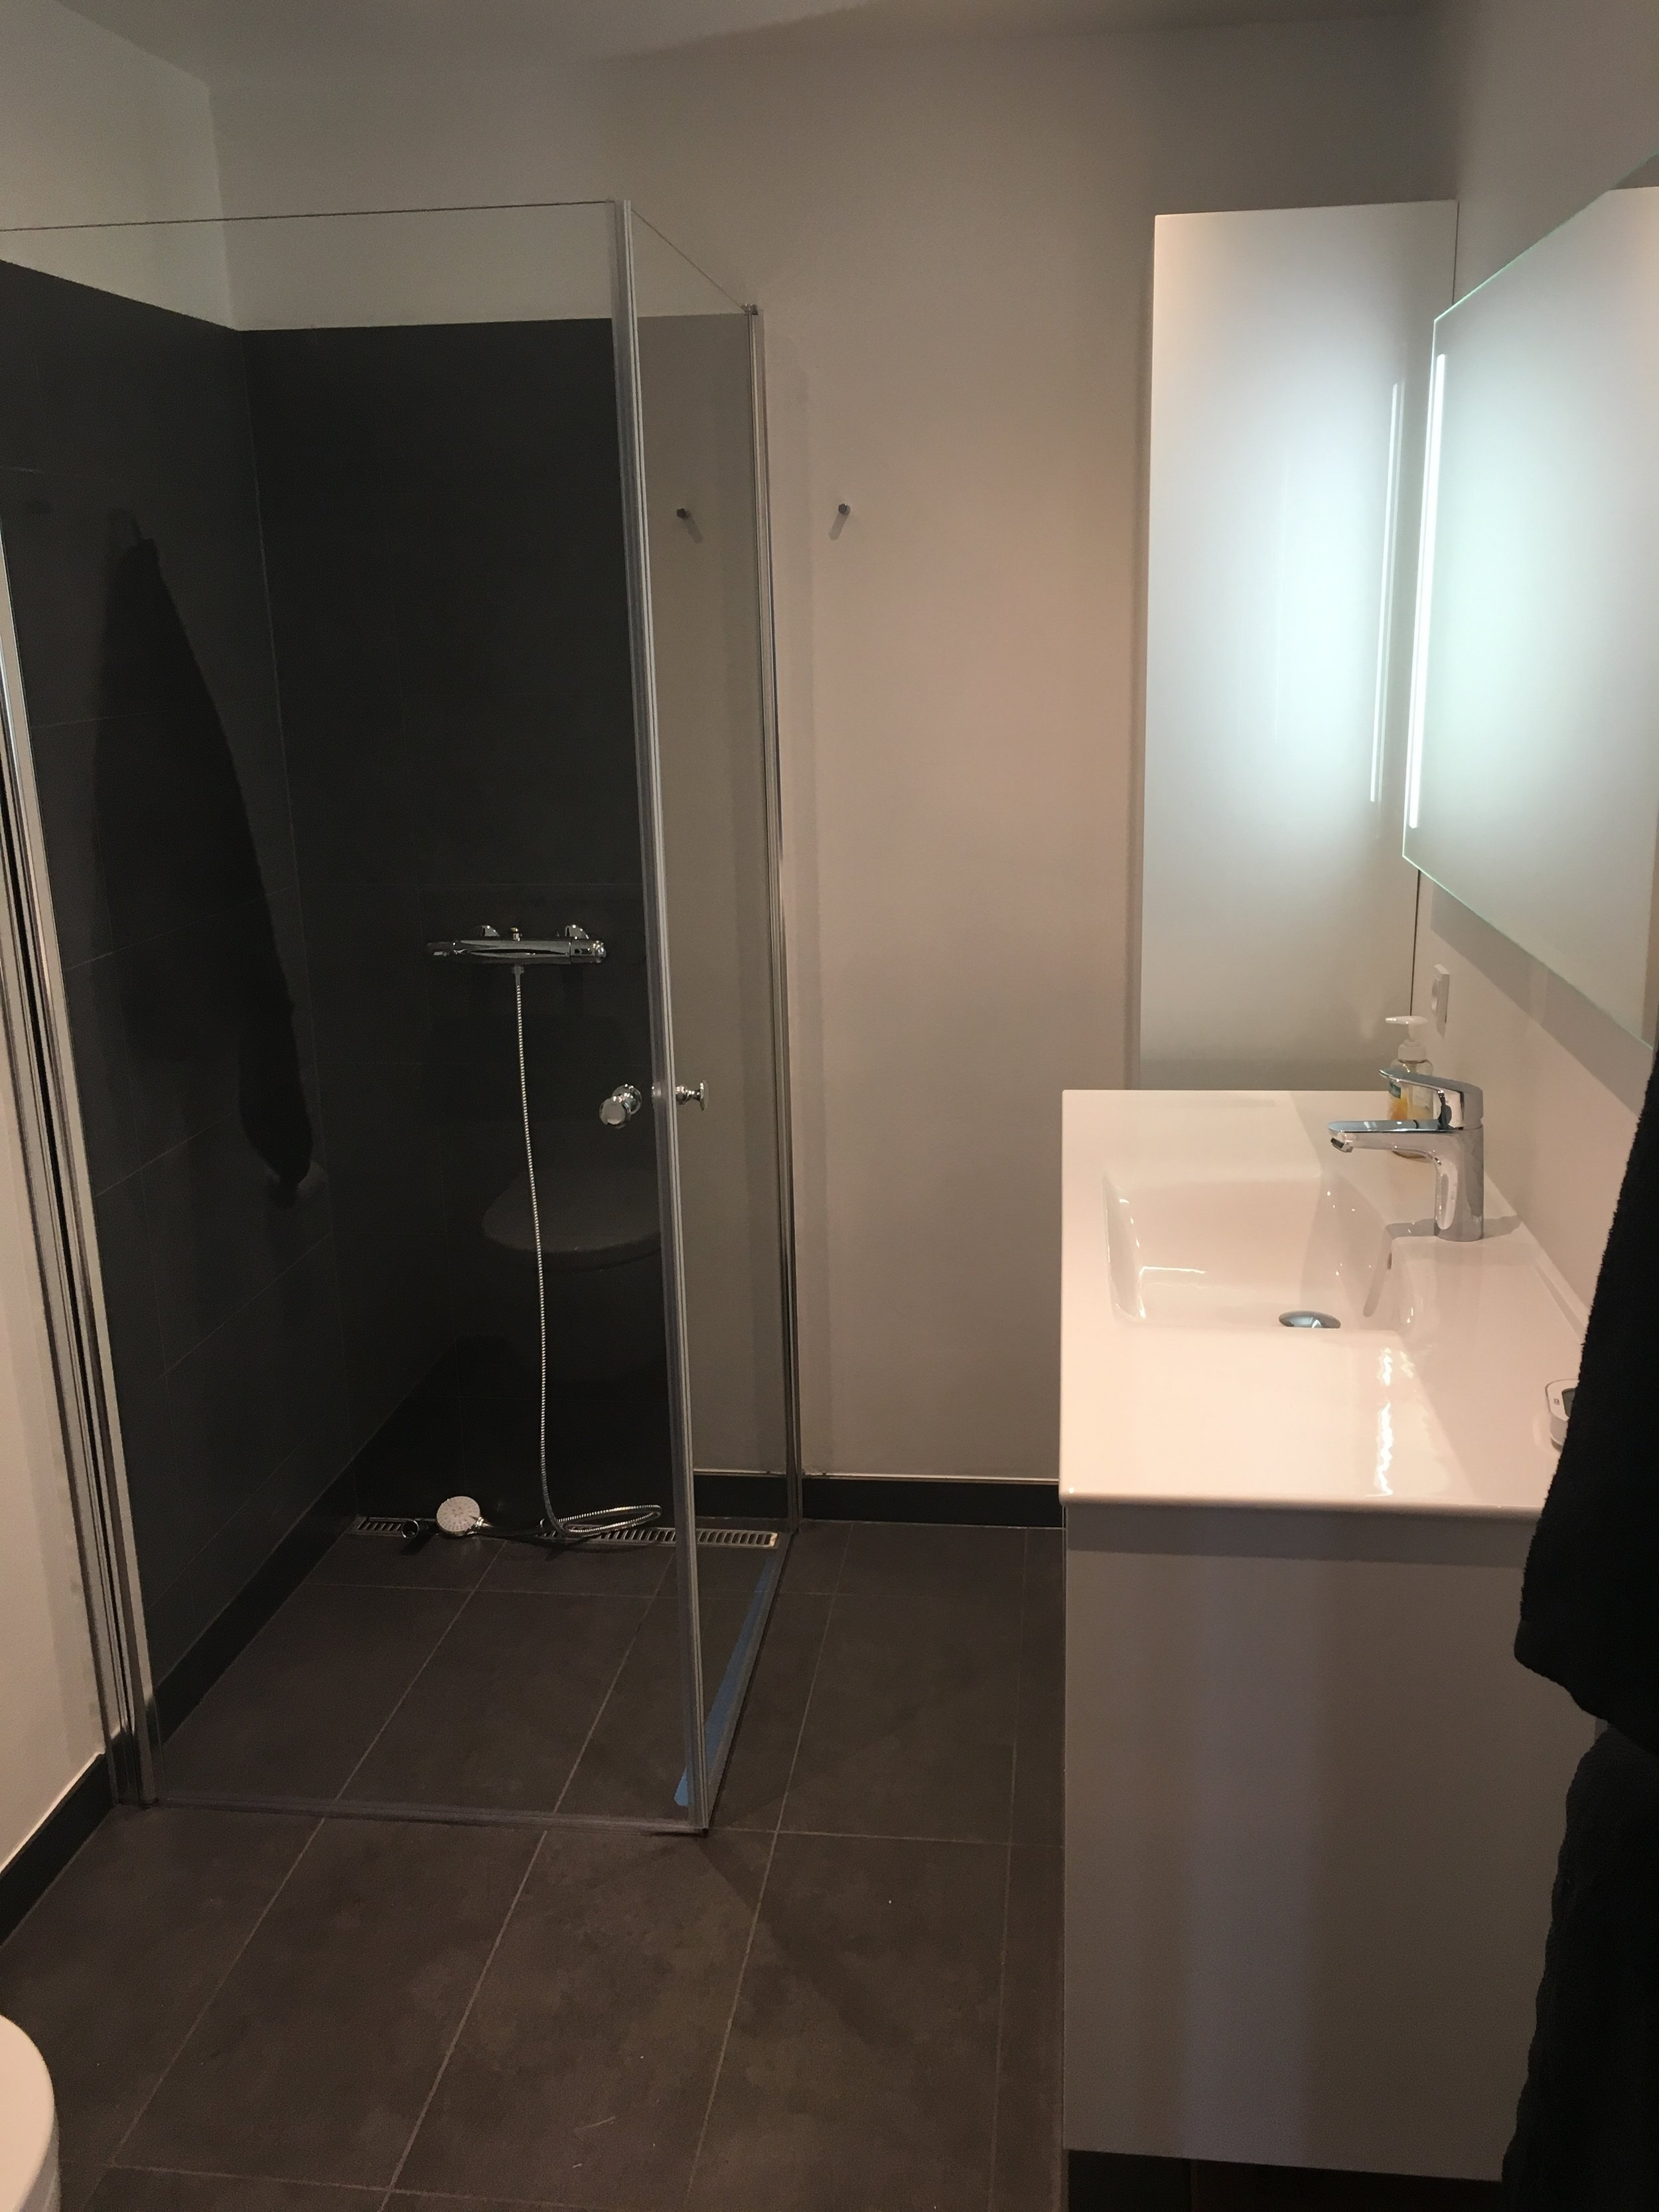 Totalenterprise - Badeværelse med nedsænket bruseniche med Unidrain og brusehjørne, Ifø Sense håndvaskemøbel.